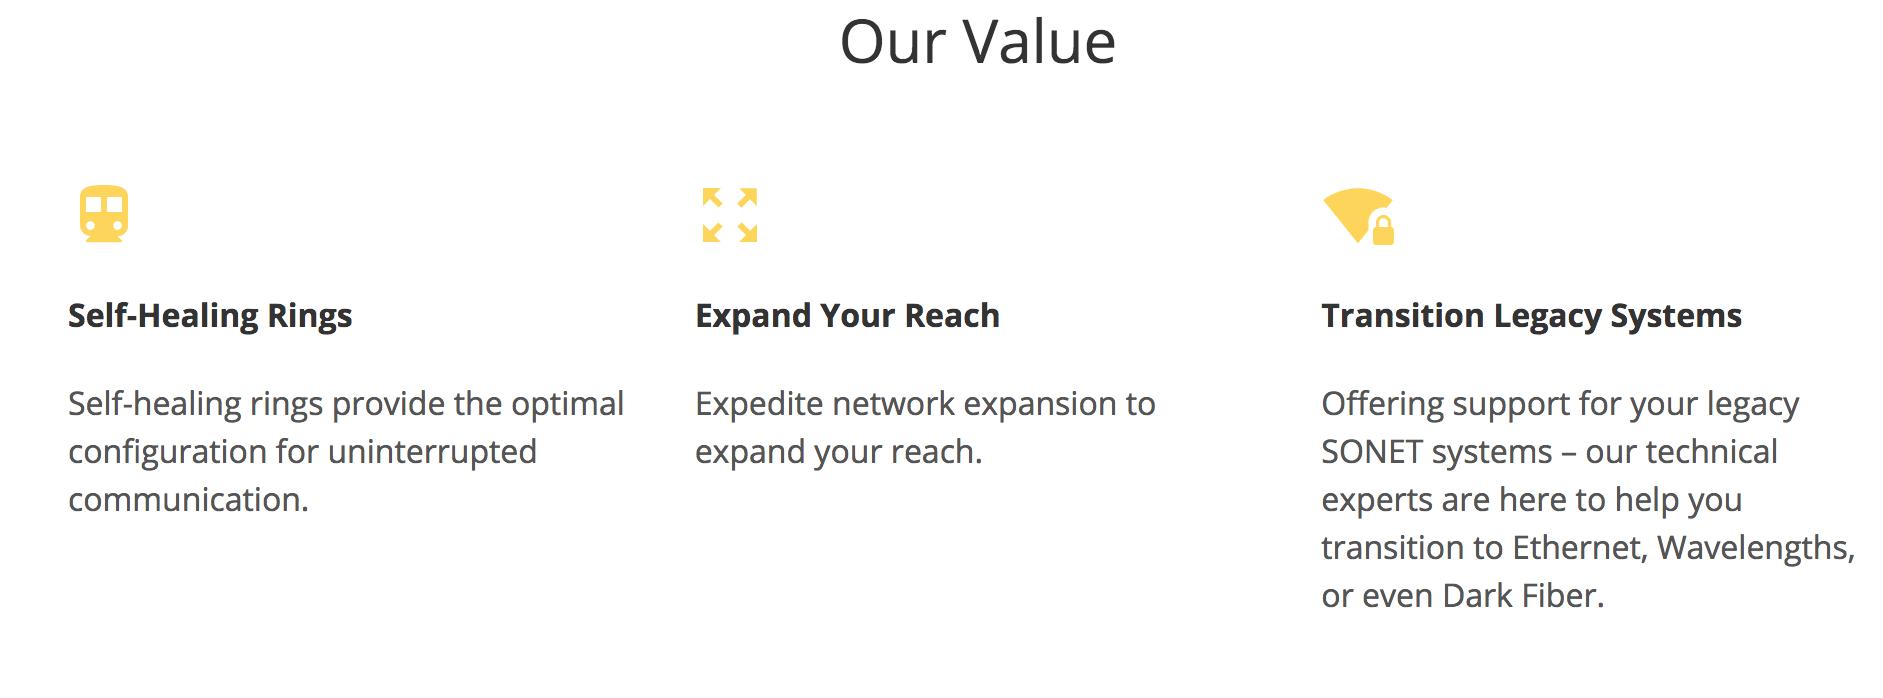 value of SONET service - Edison